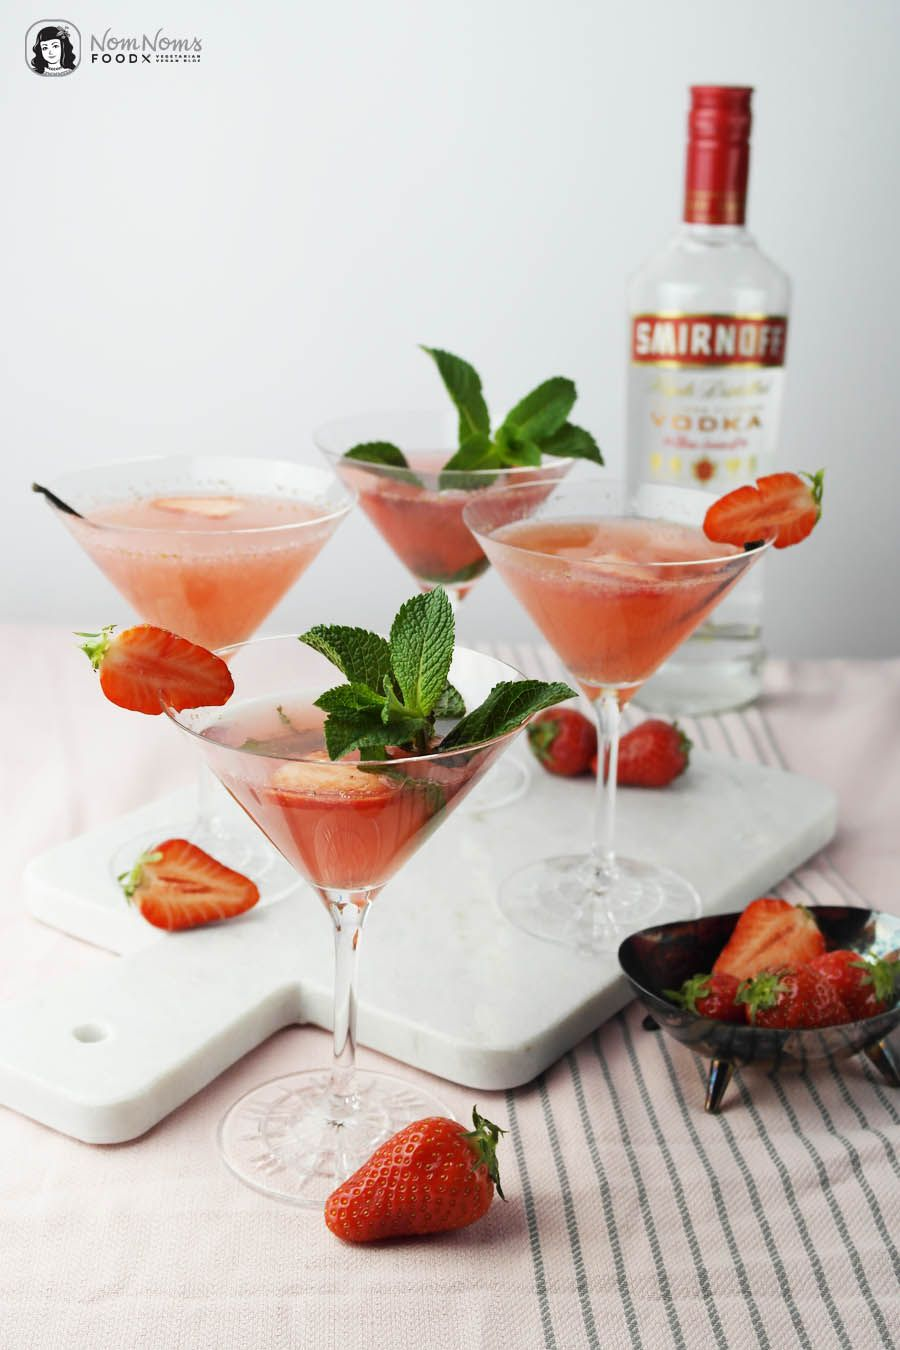 Großartig Longdrinks Klassiker Beste Wahl Cocktail Classic: Strawberry Cosmopolitan With Vanilla Or